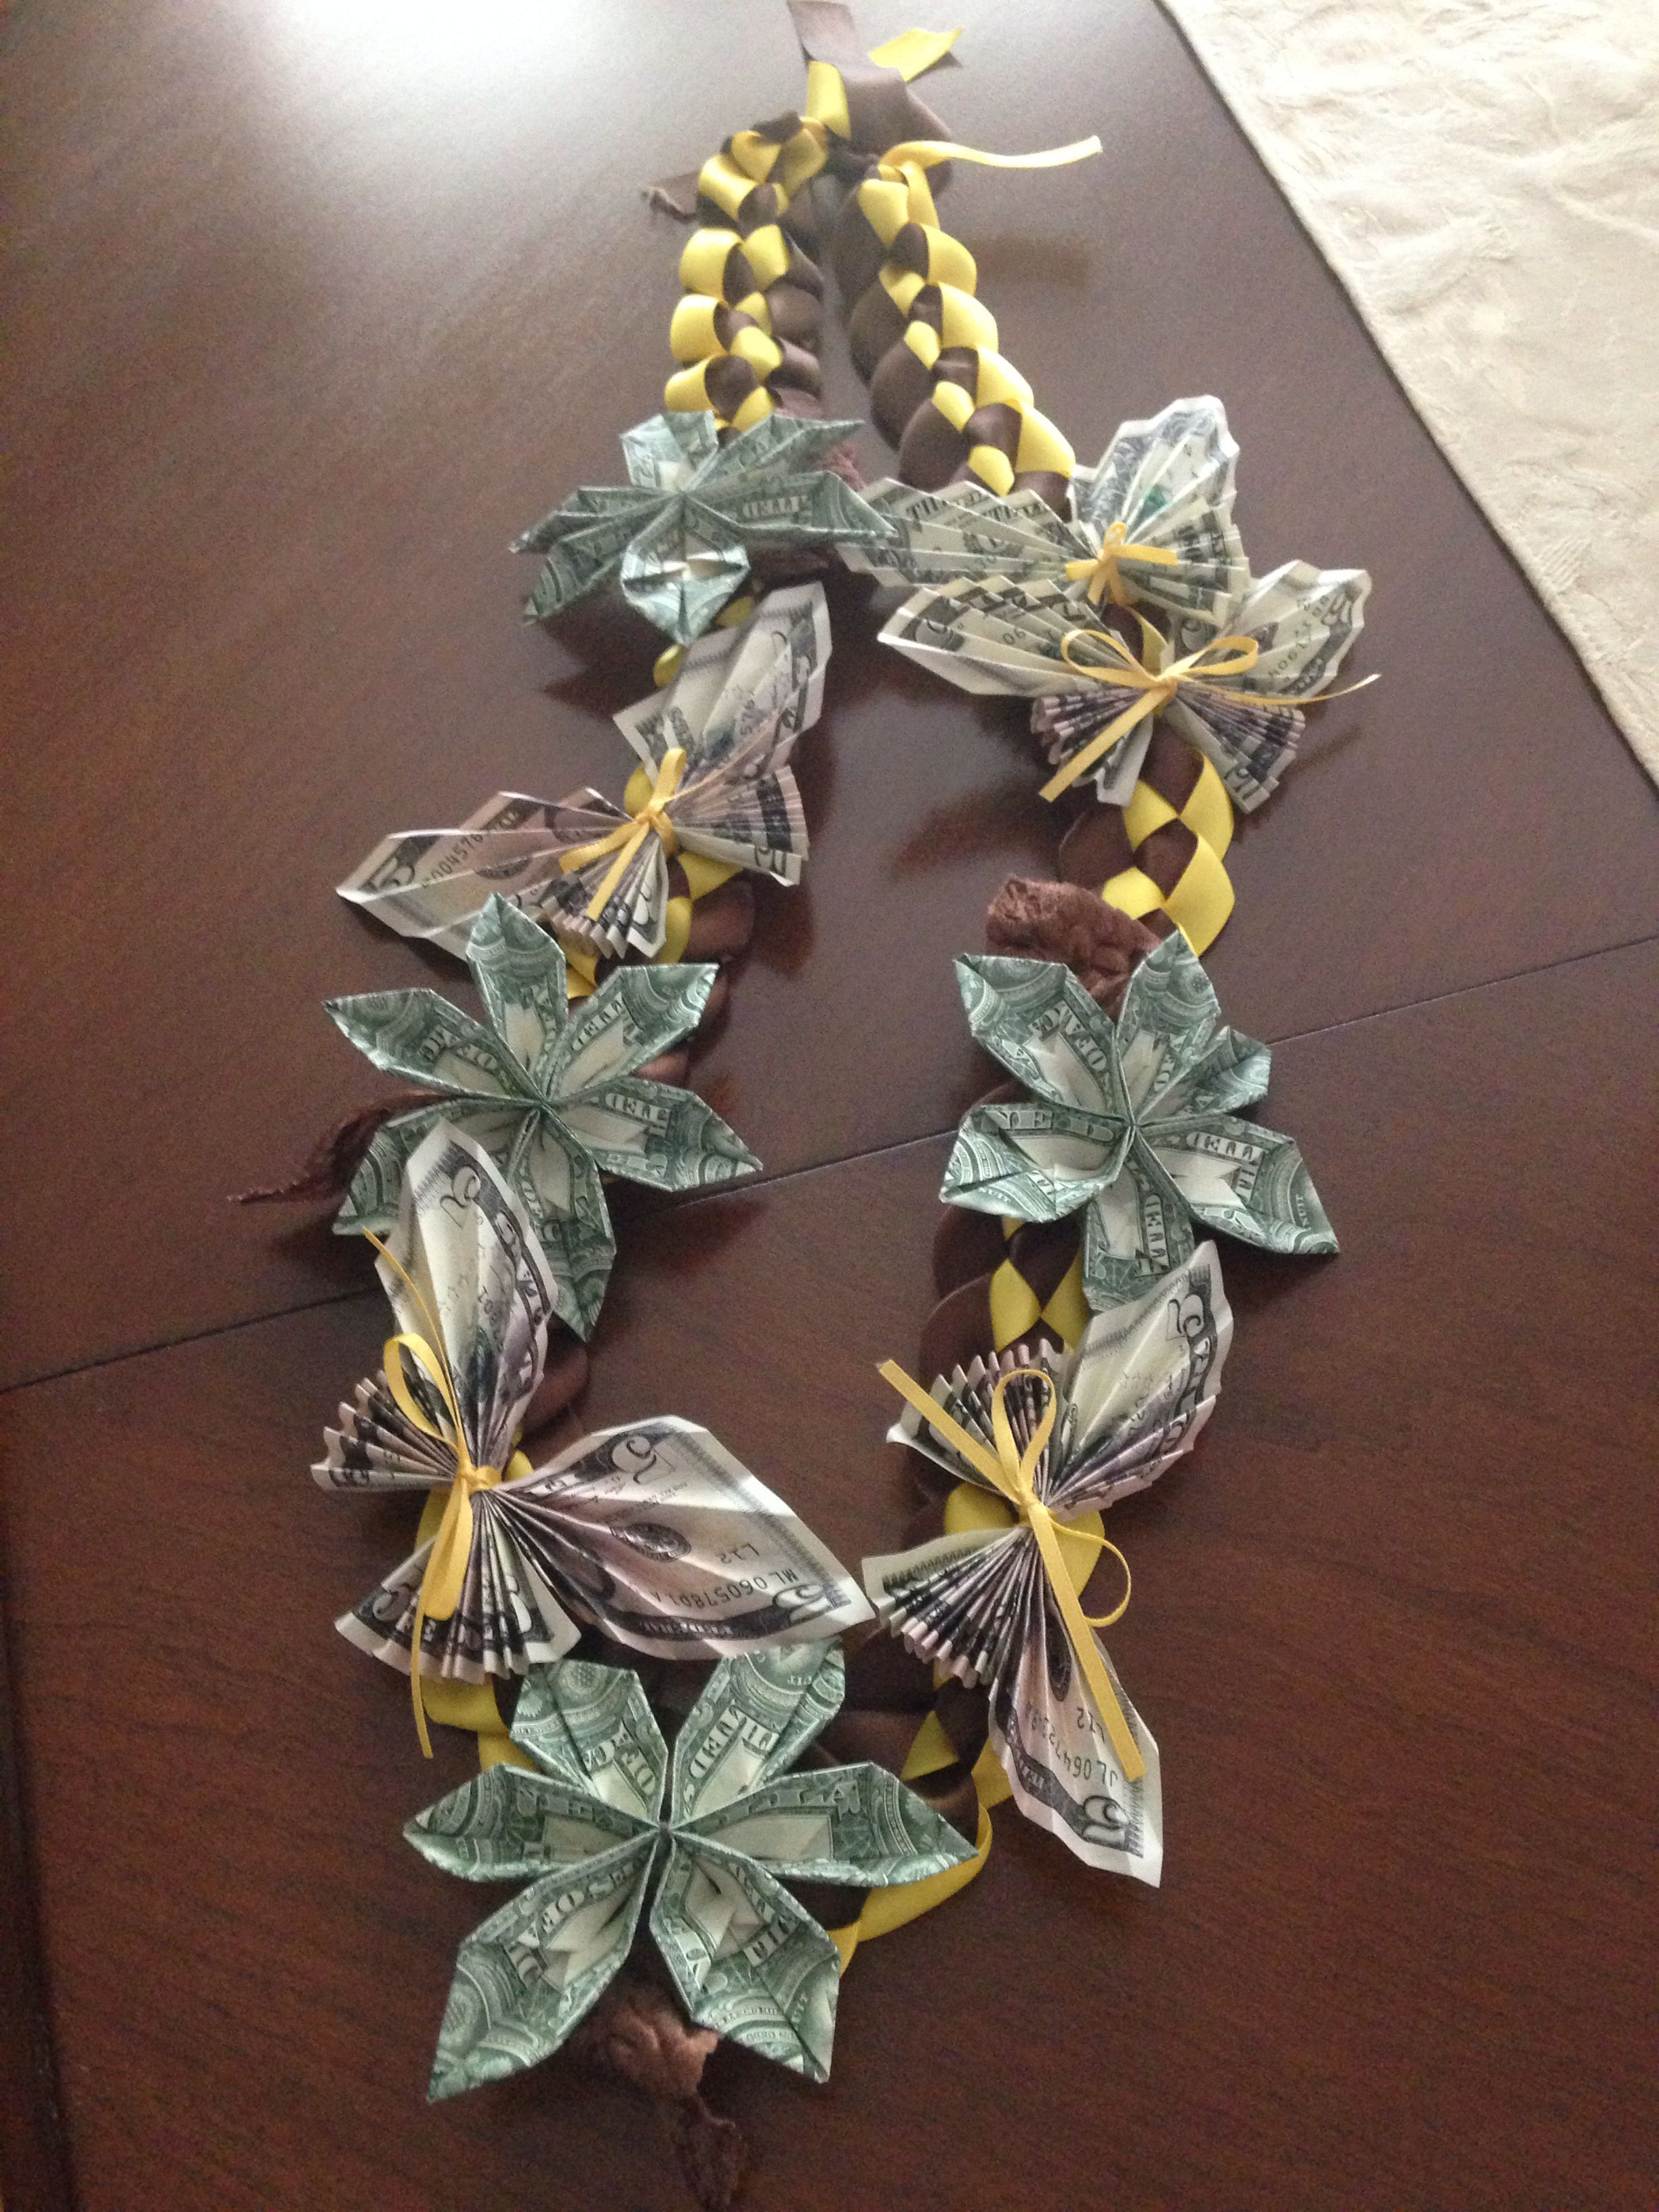 Money Ribbon Graduation Lei With Butterfly S And Plumeria Flowers Plumeria Flowers Graduation Money Lei Money Flowers